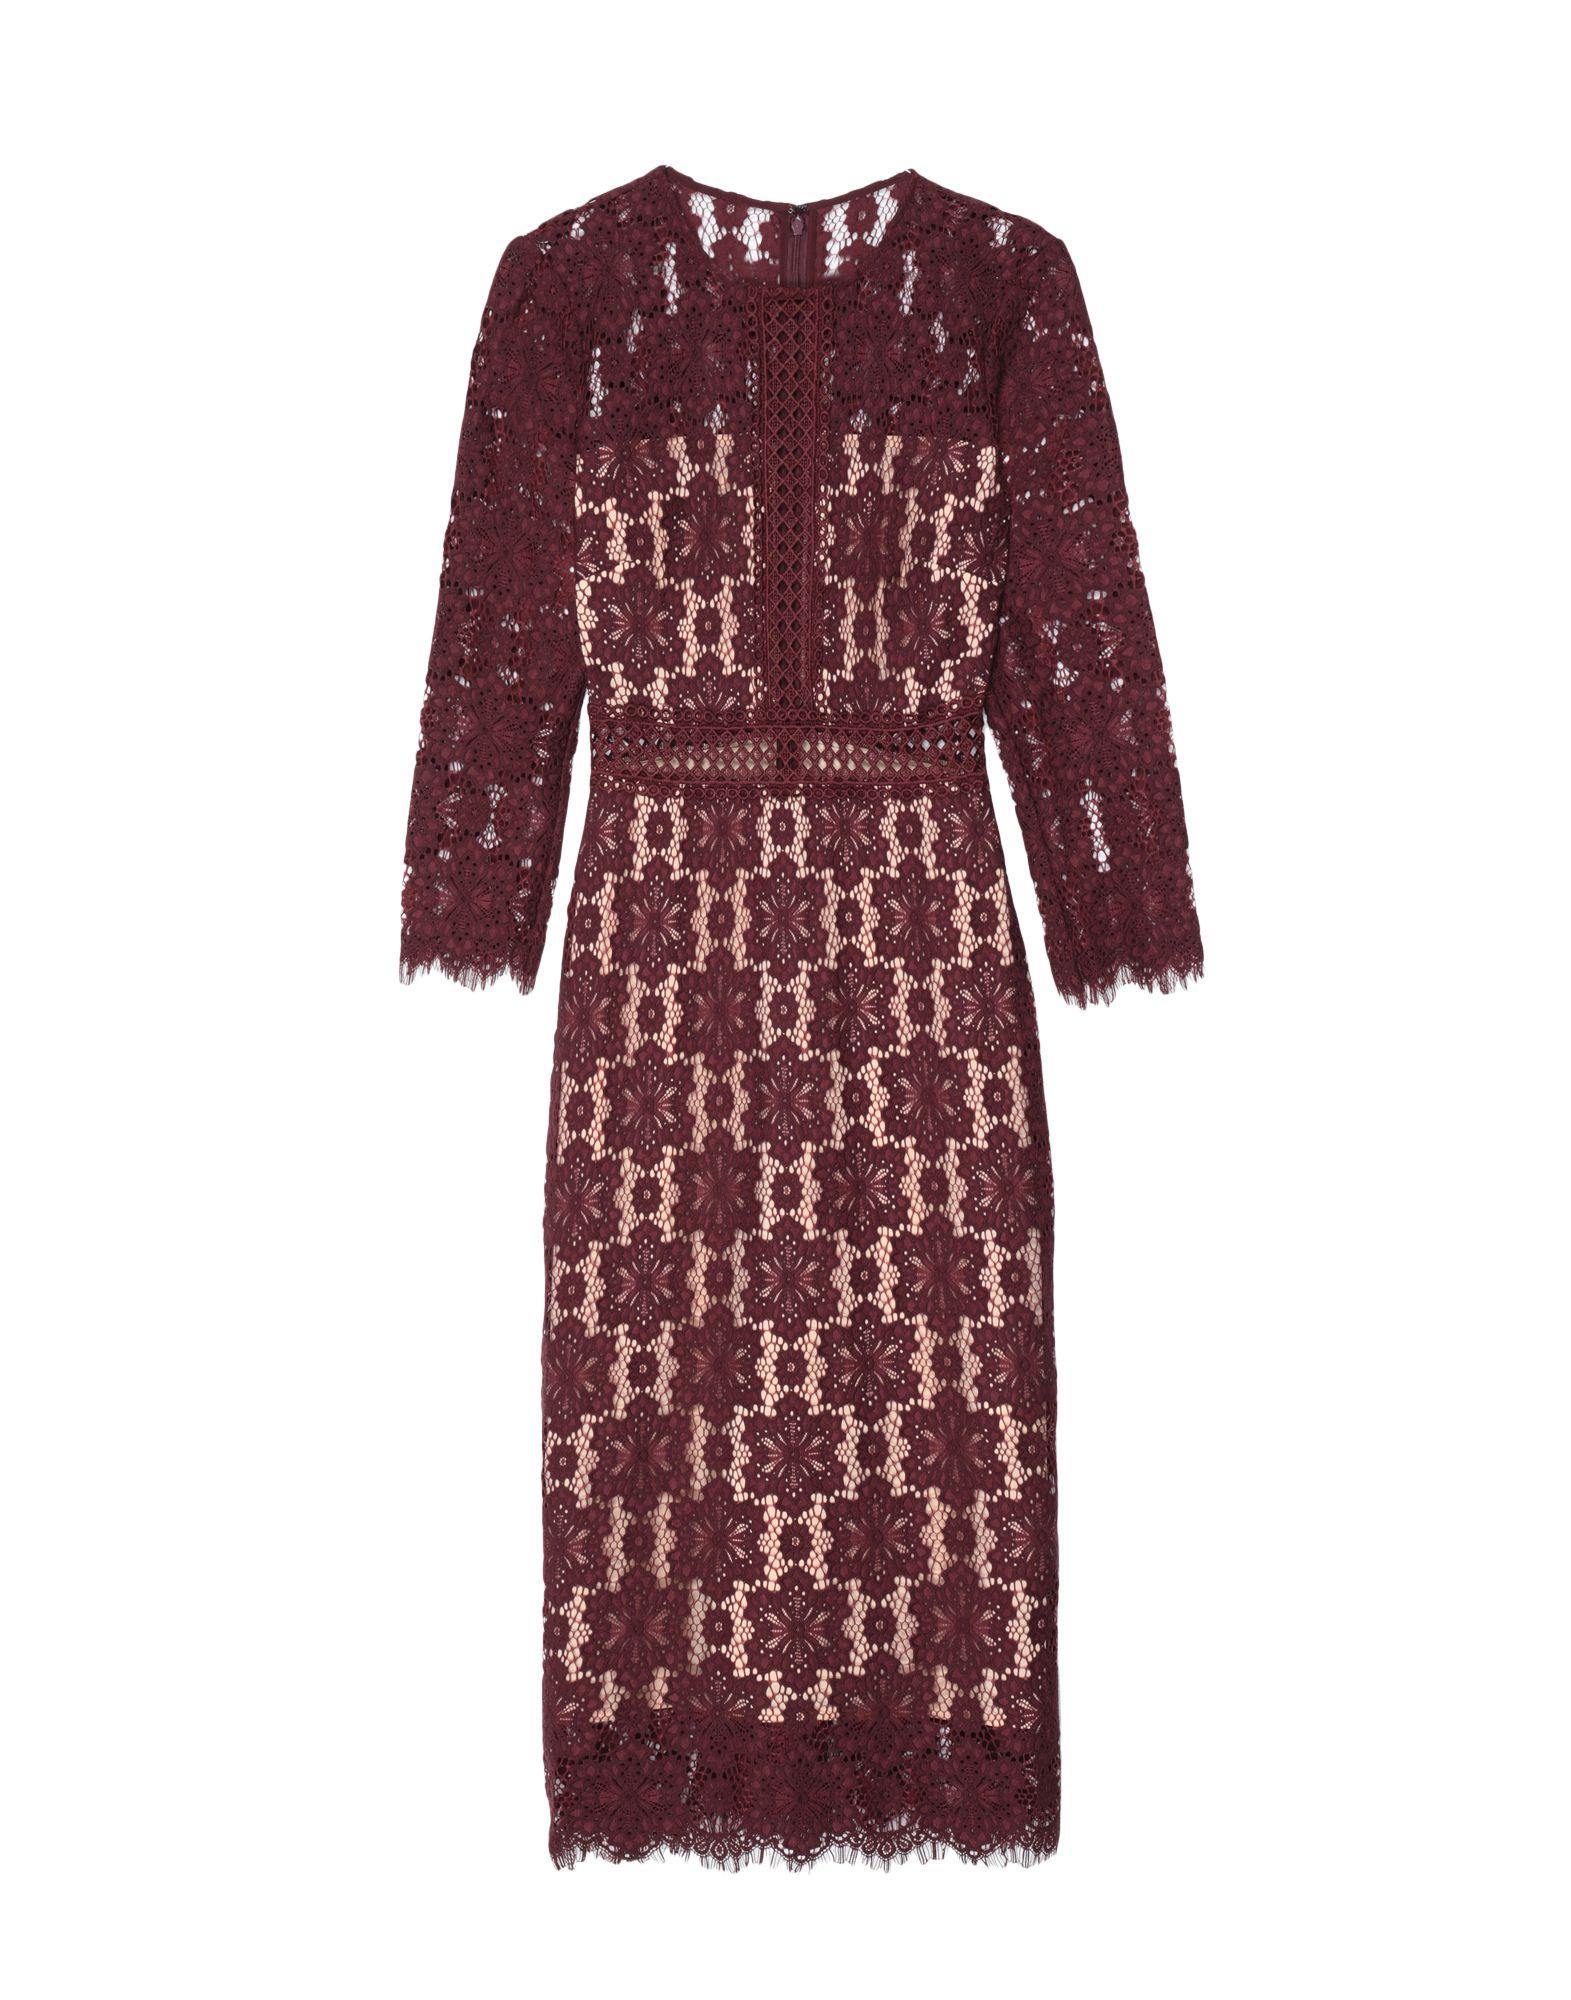 8 by YOOX Платье длиной 3/4